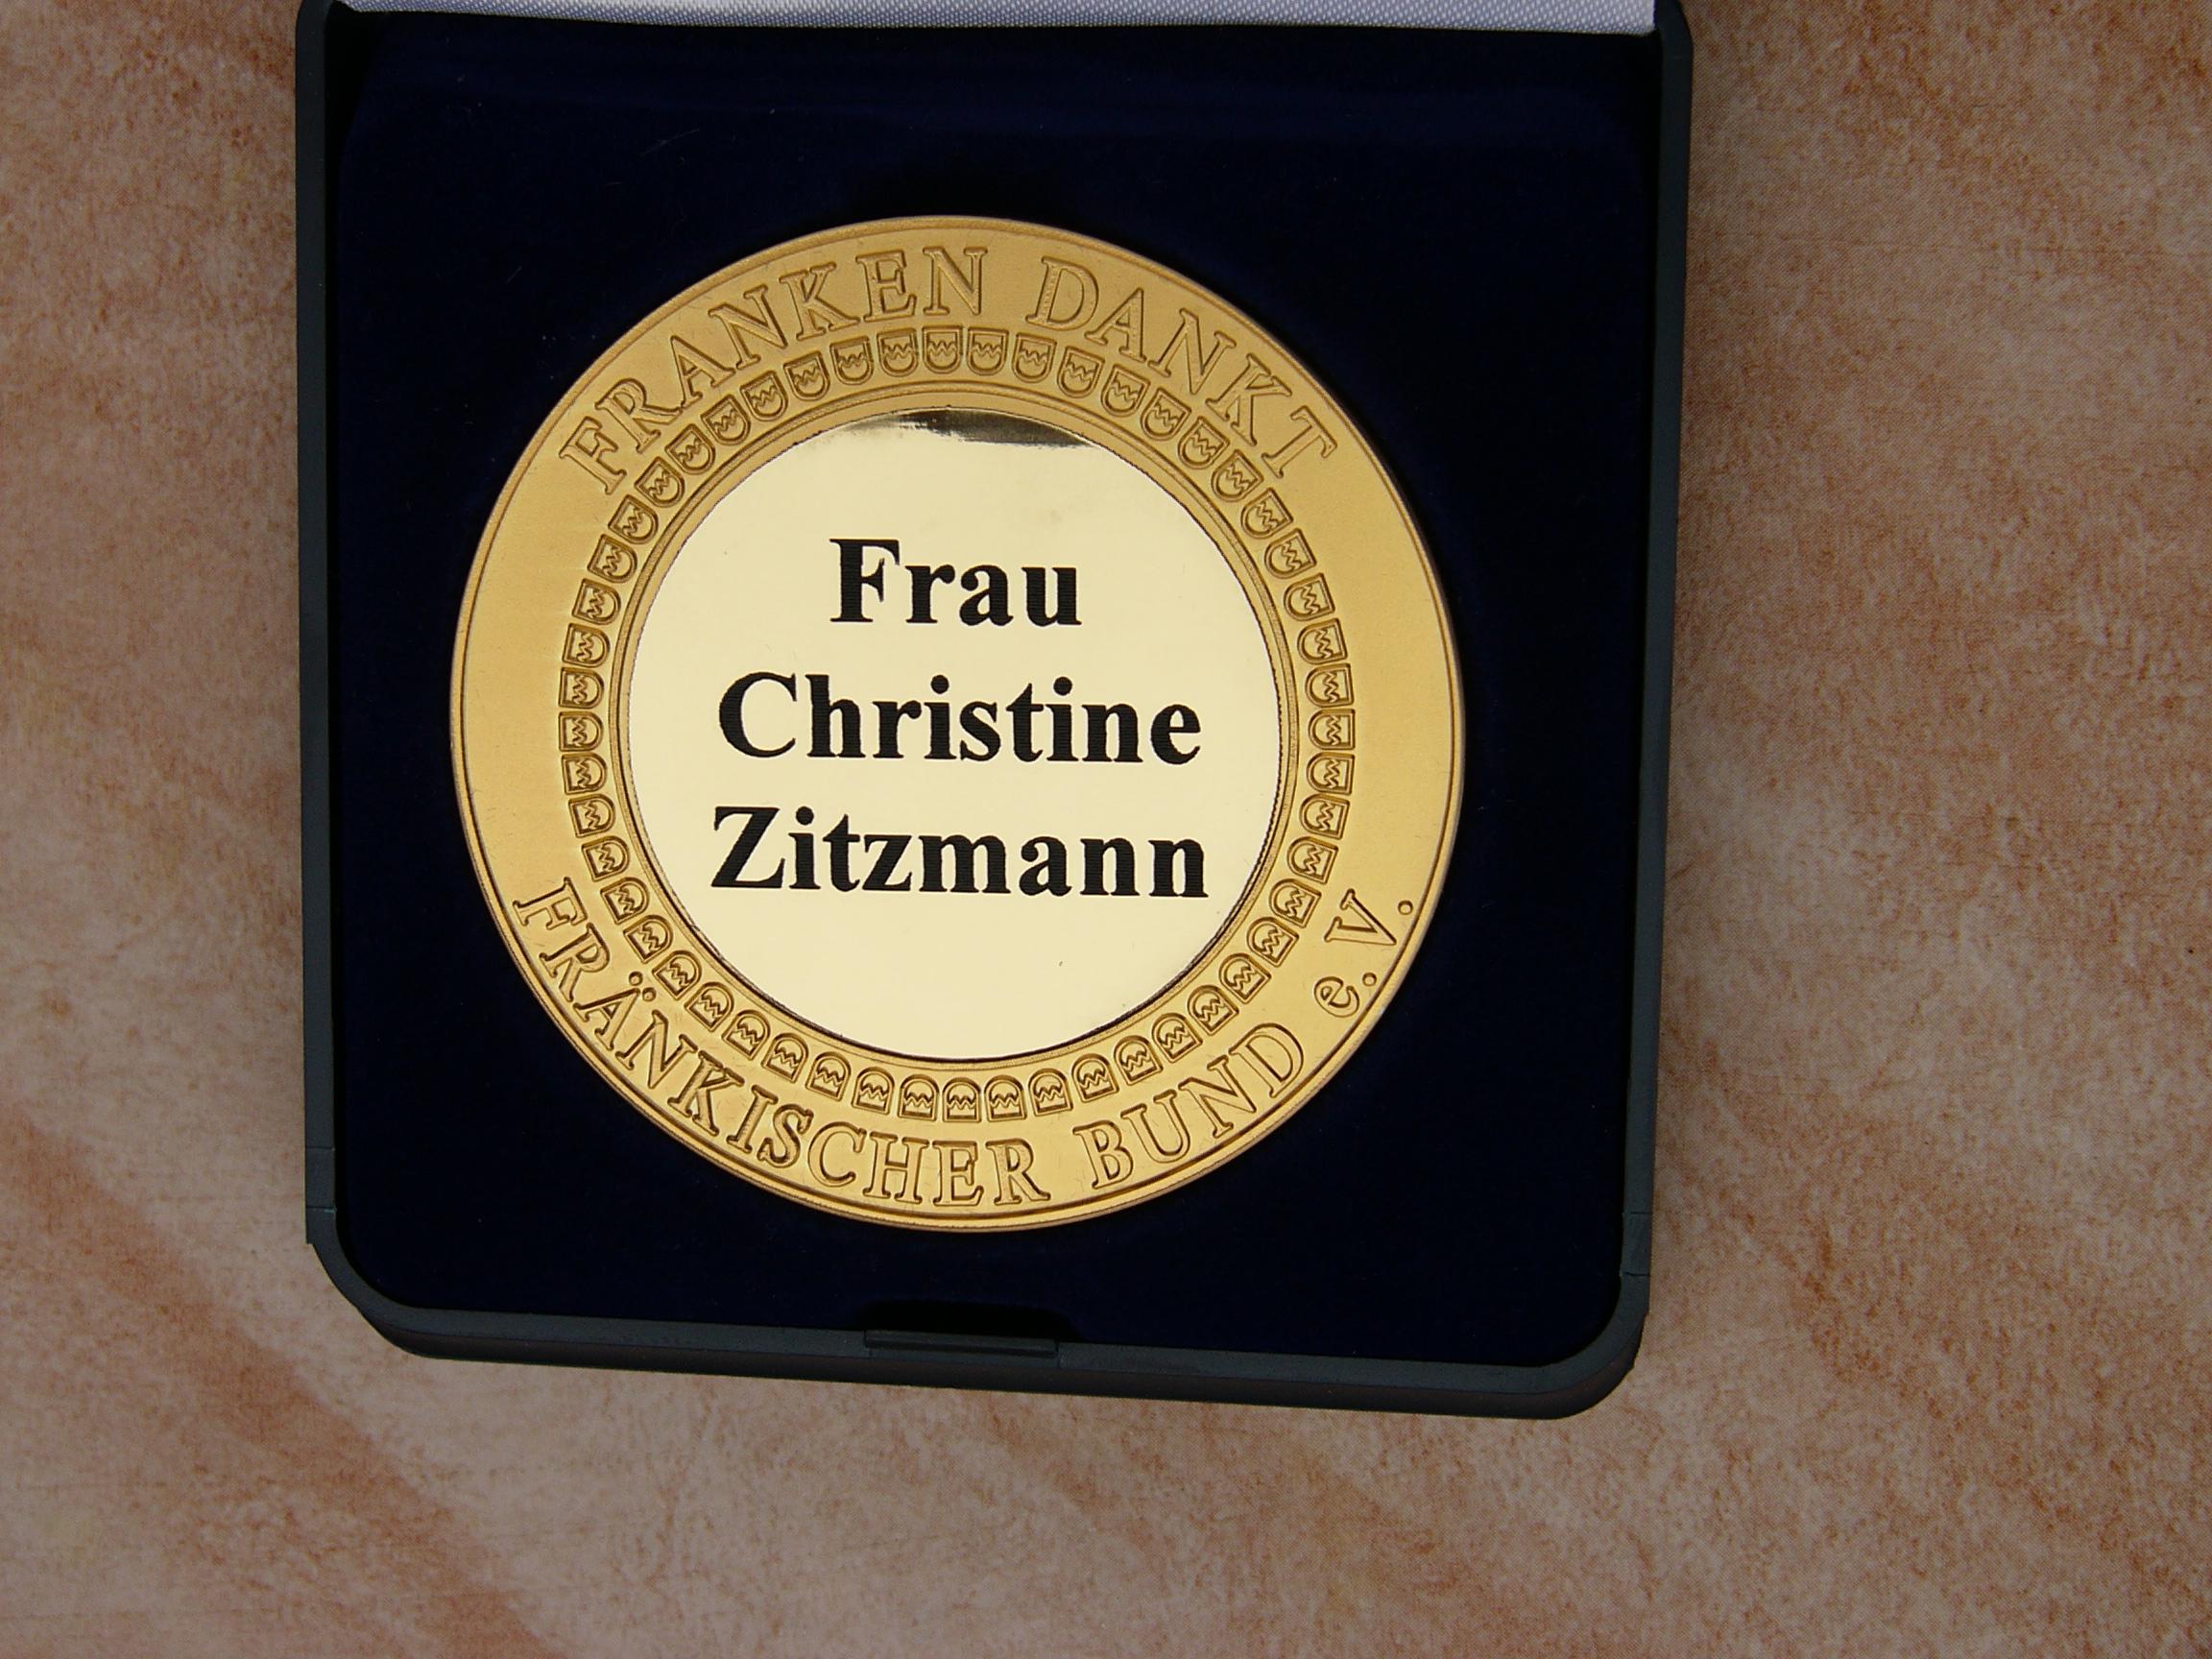 2015 10 Frankenmedaille Fo.J.Kalb